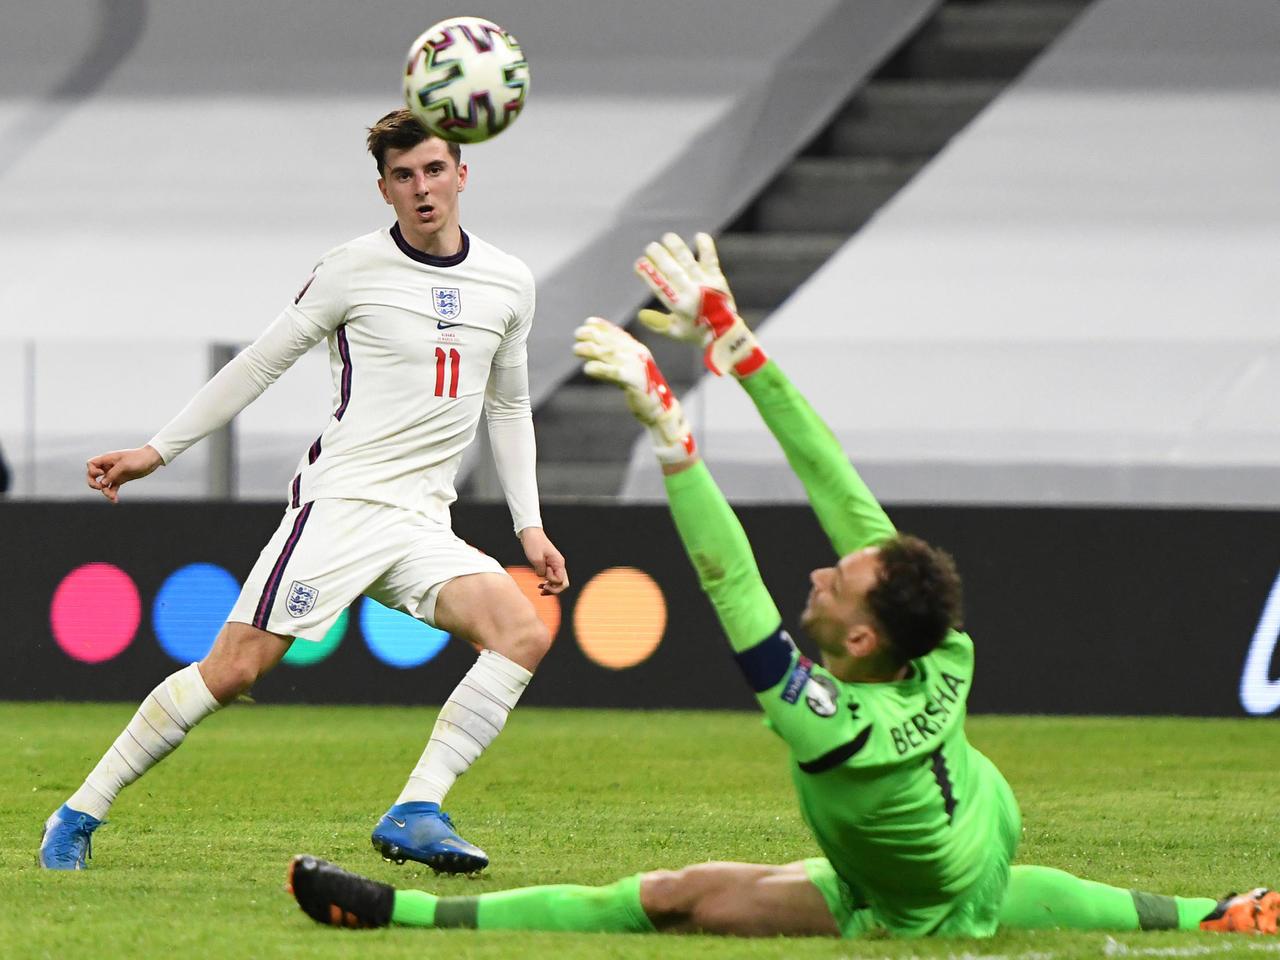 مدرب إنجلترا: ماونت لاعب استثنائي